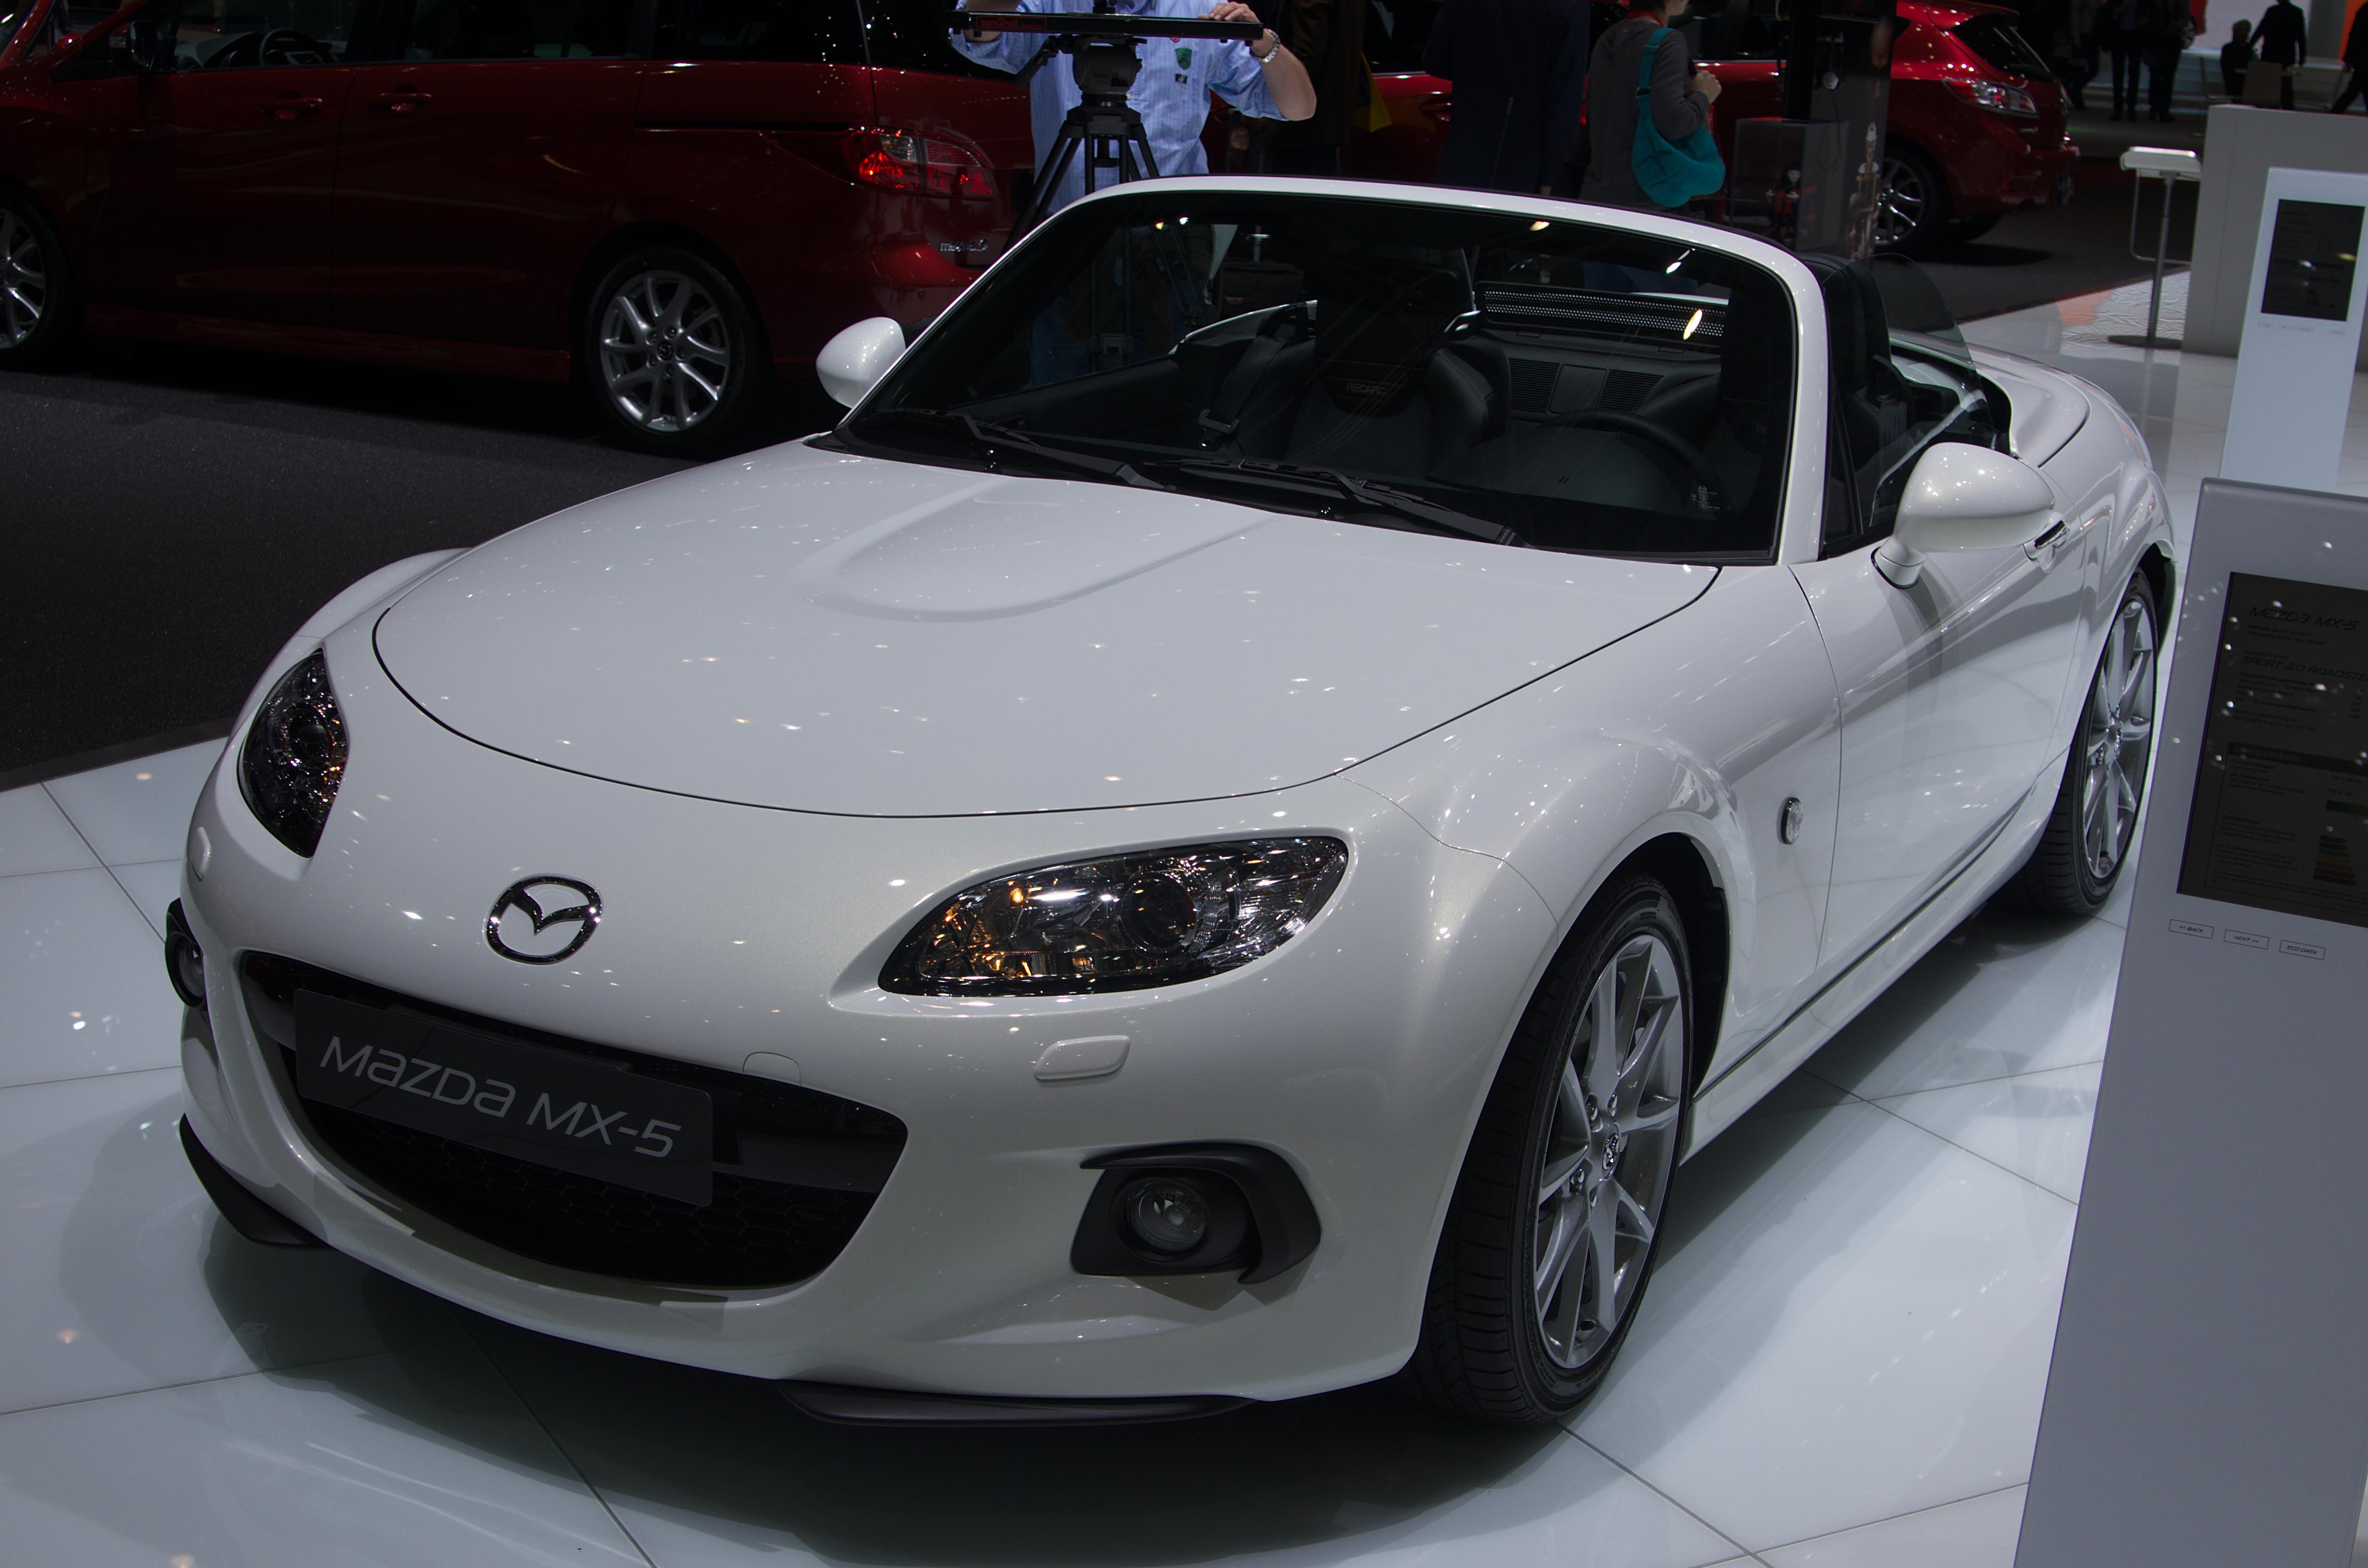 https://upload.wikimedia.org/wikipedia/commons/d/d4/Geneva_MotorShow_2013_-_Mazda_MX-5.jpg